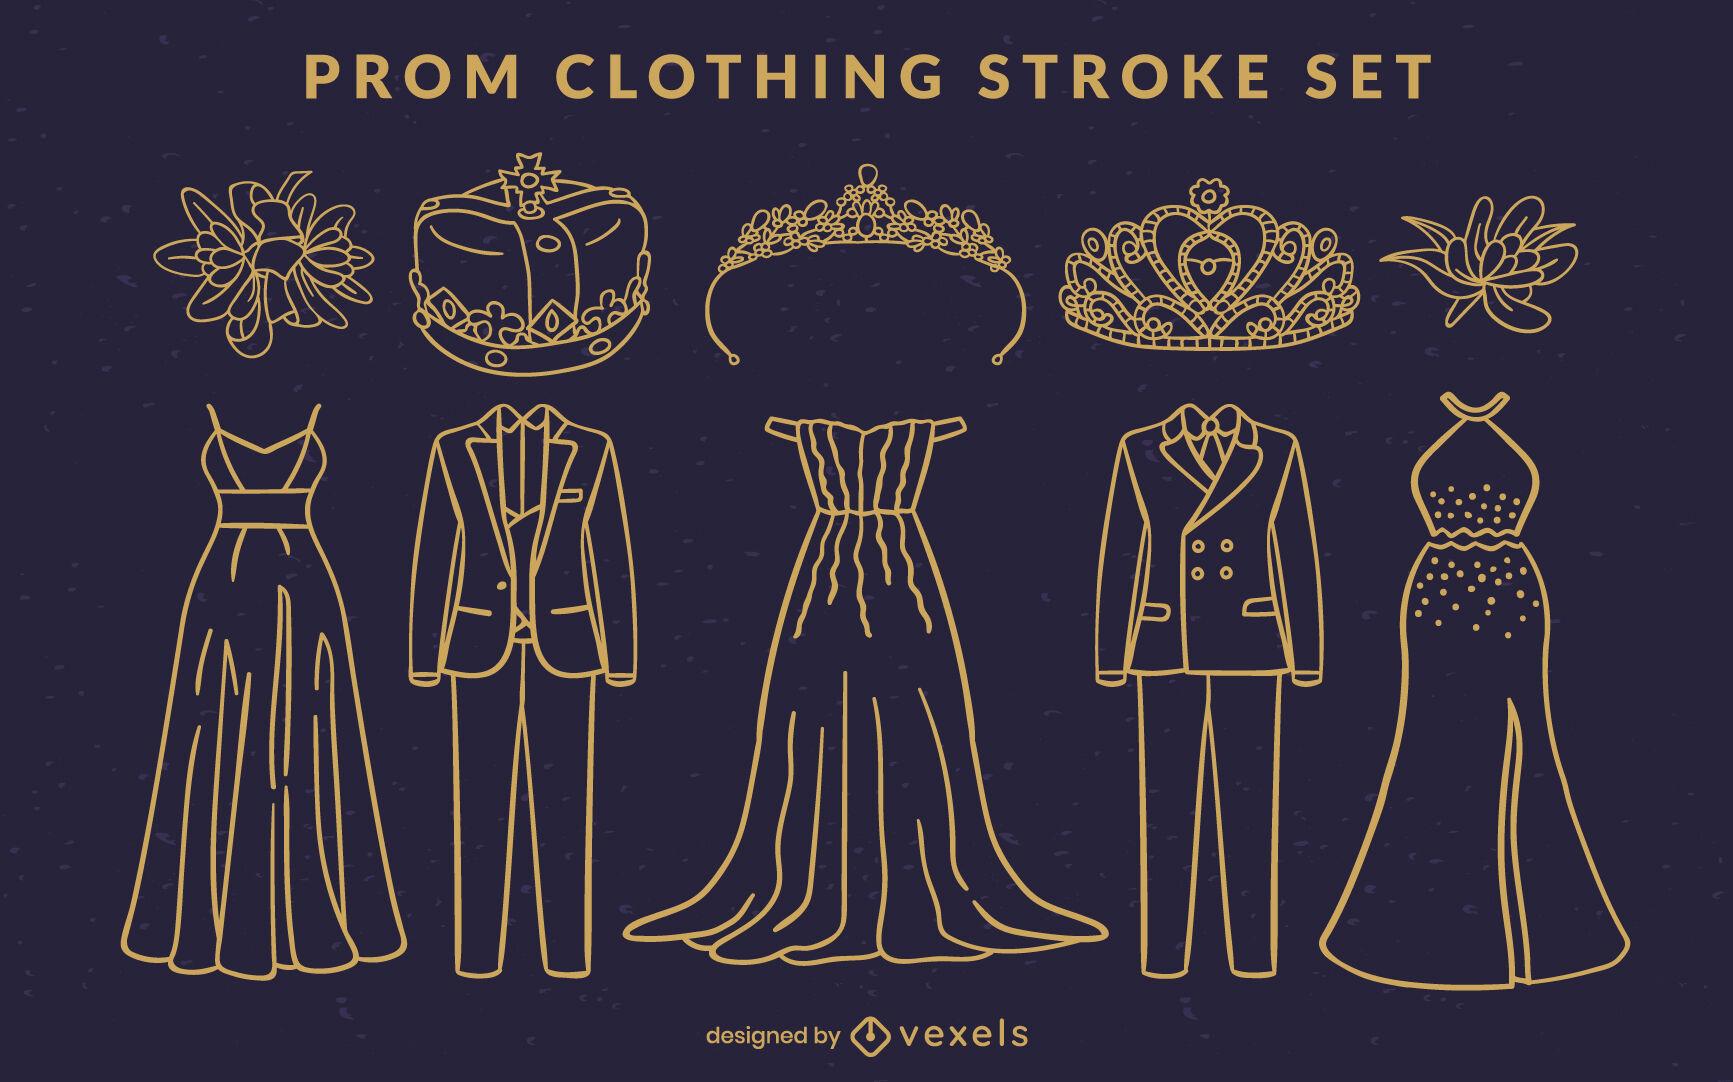 Prom party fancy clothing stroke set